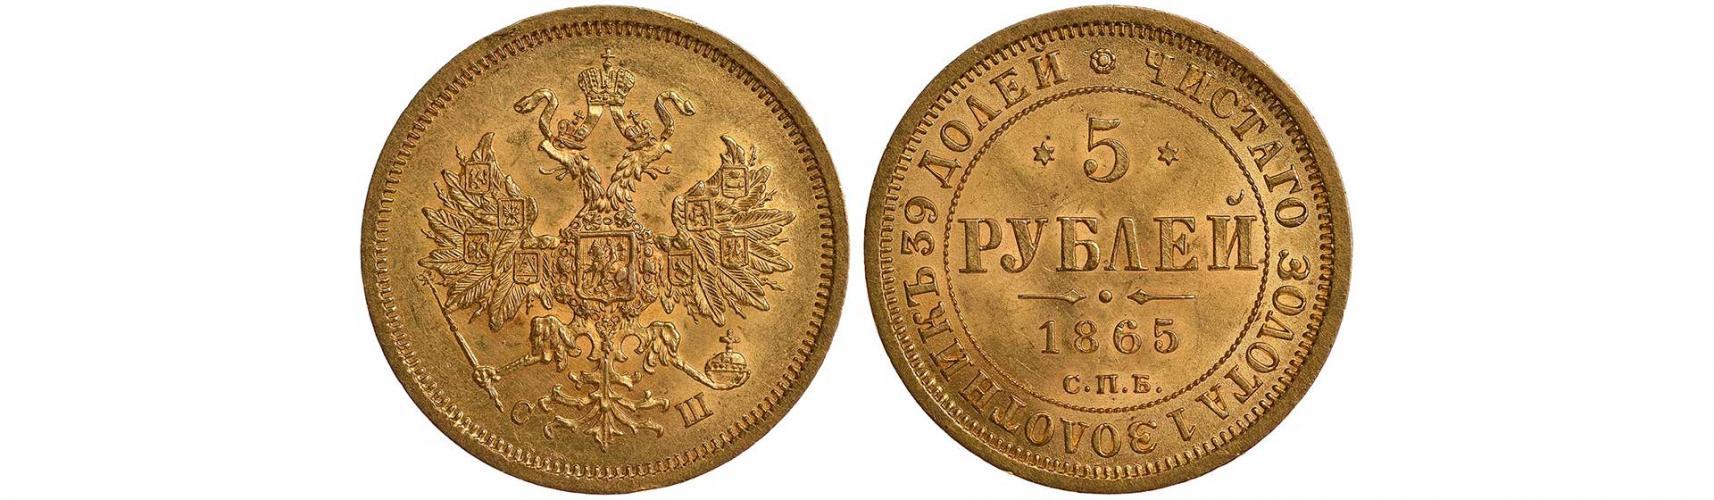 Скупка царских монет из золота